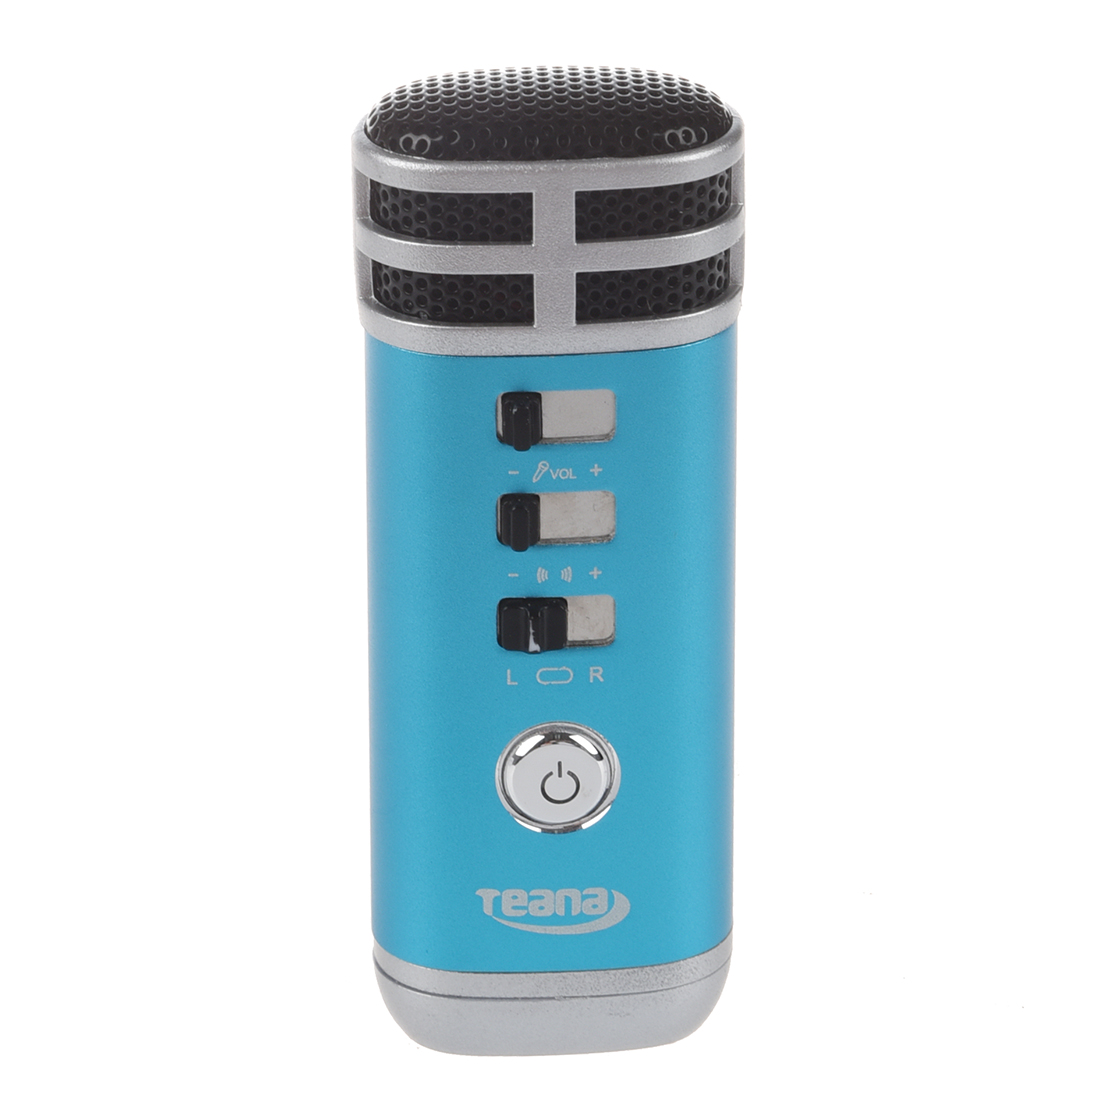 Teana Mini 3.5mm Microphone Karaoke Player for PC/Phone/PSP/MP4/MP3 Blue Z2W7